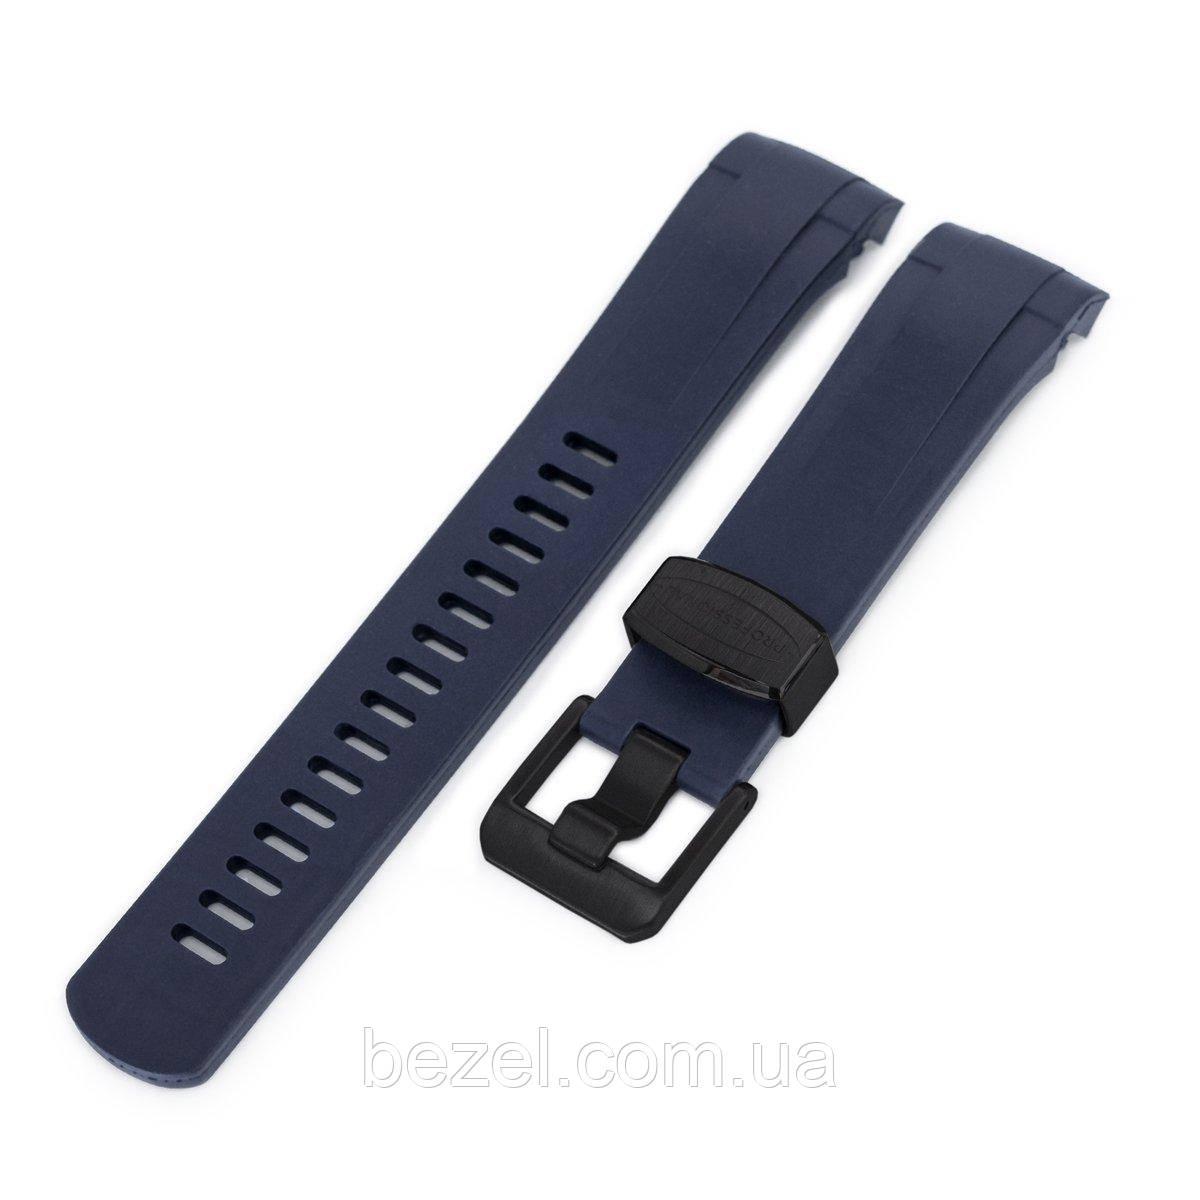 22mm Crafter Blue - Dark Blue Rubber Curved Lug Watch Strap for Tudor Black Bay M79230, PVD Black Buckle